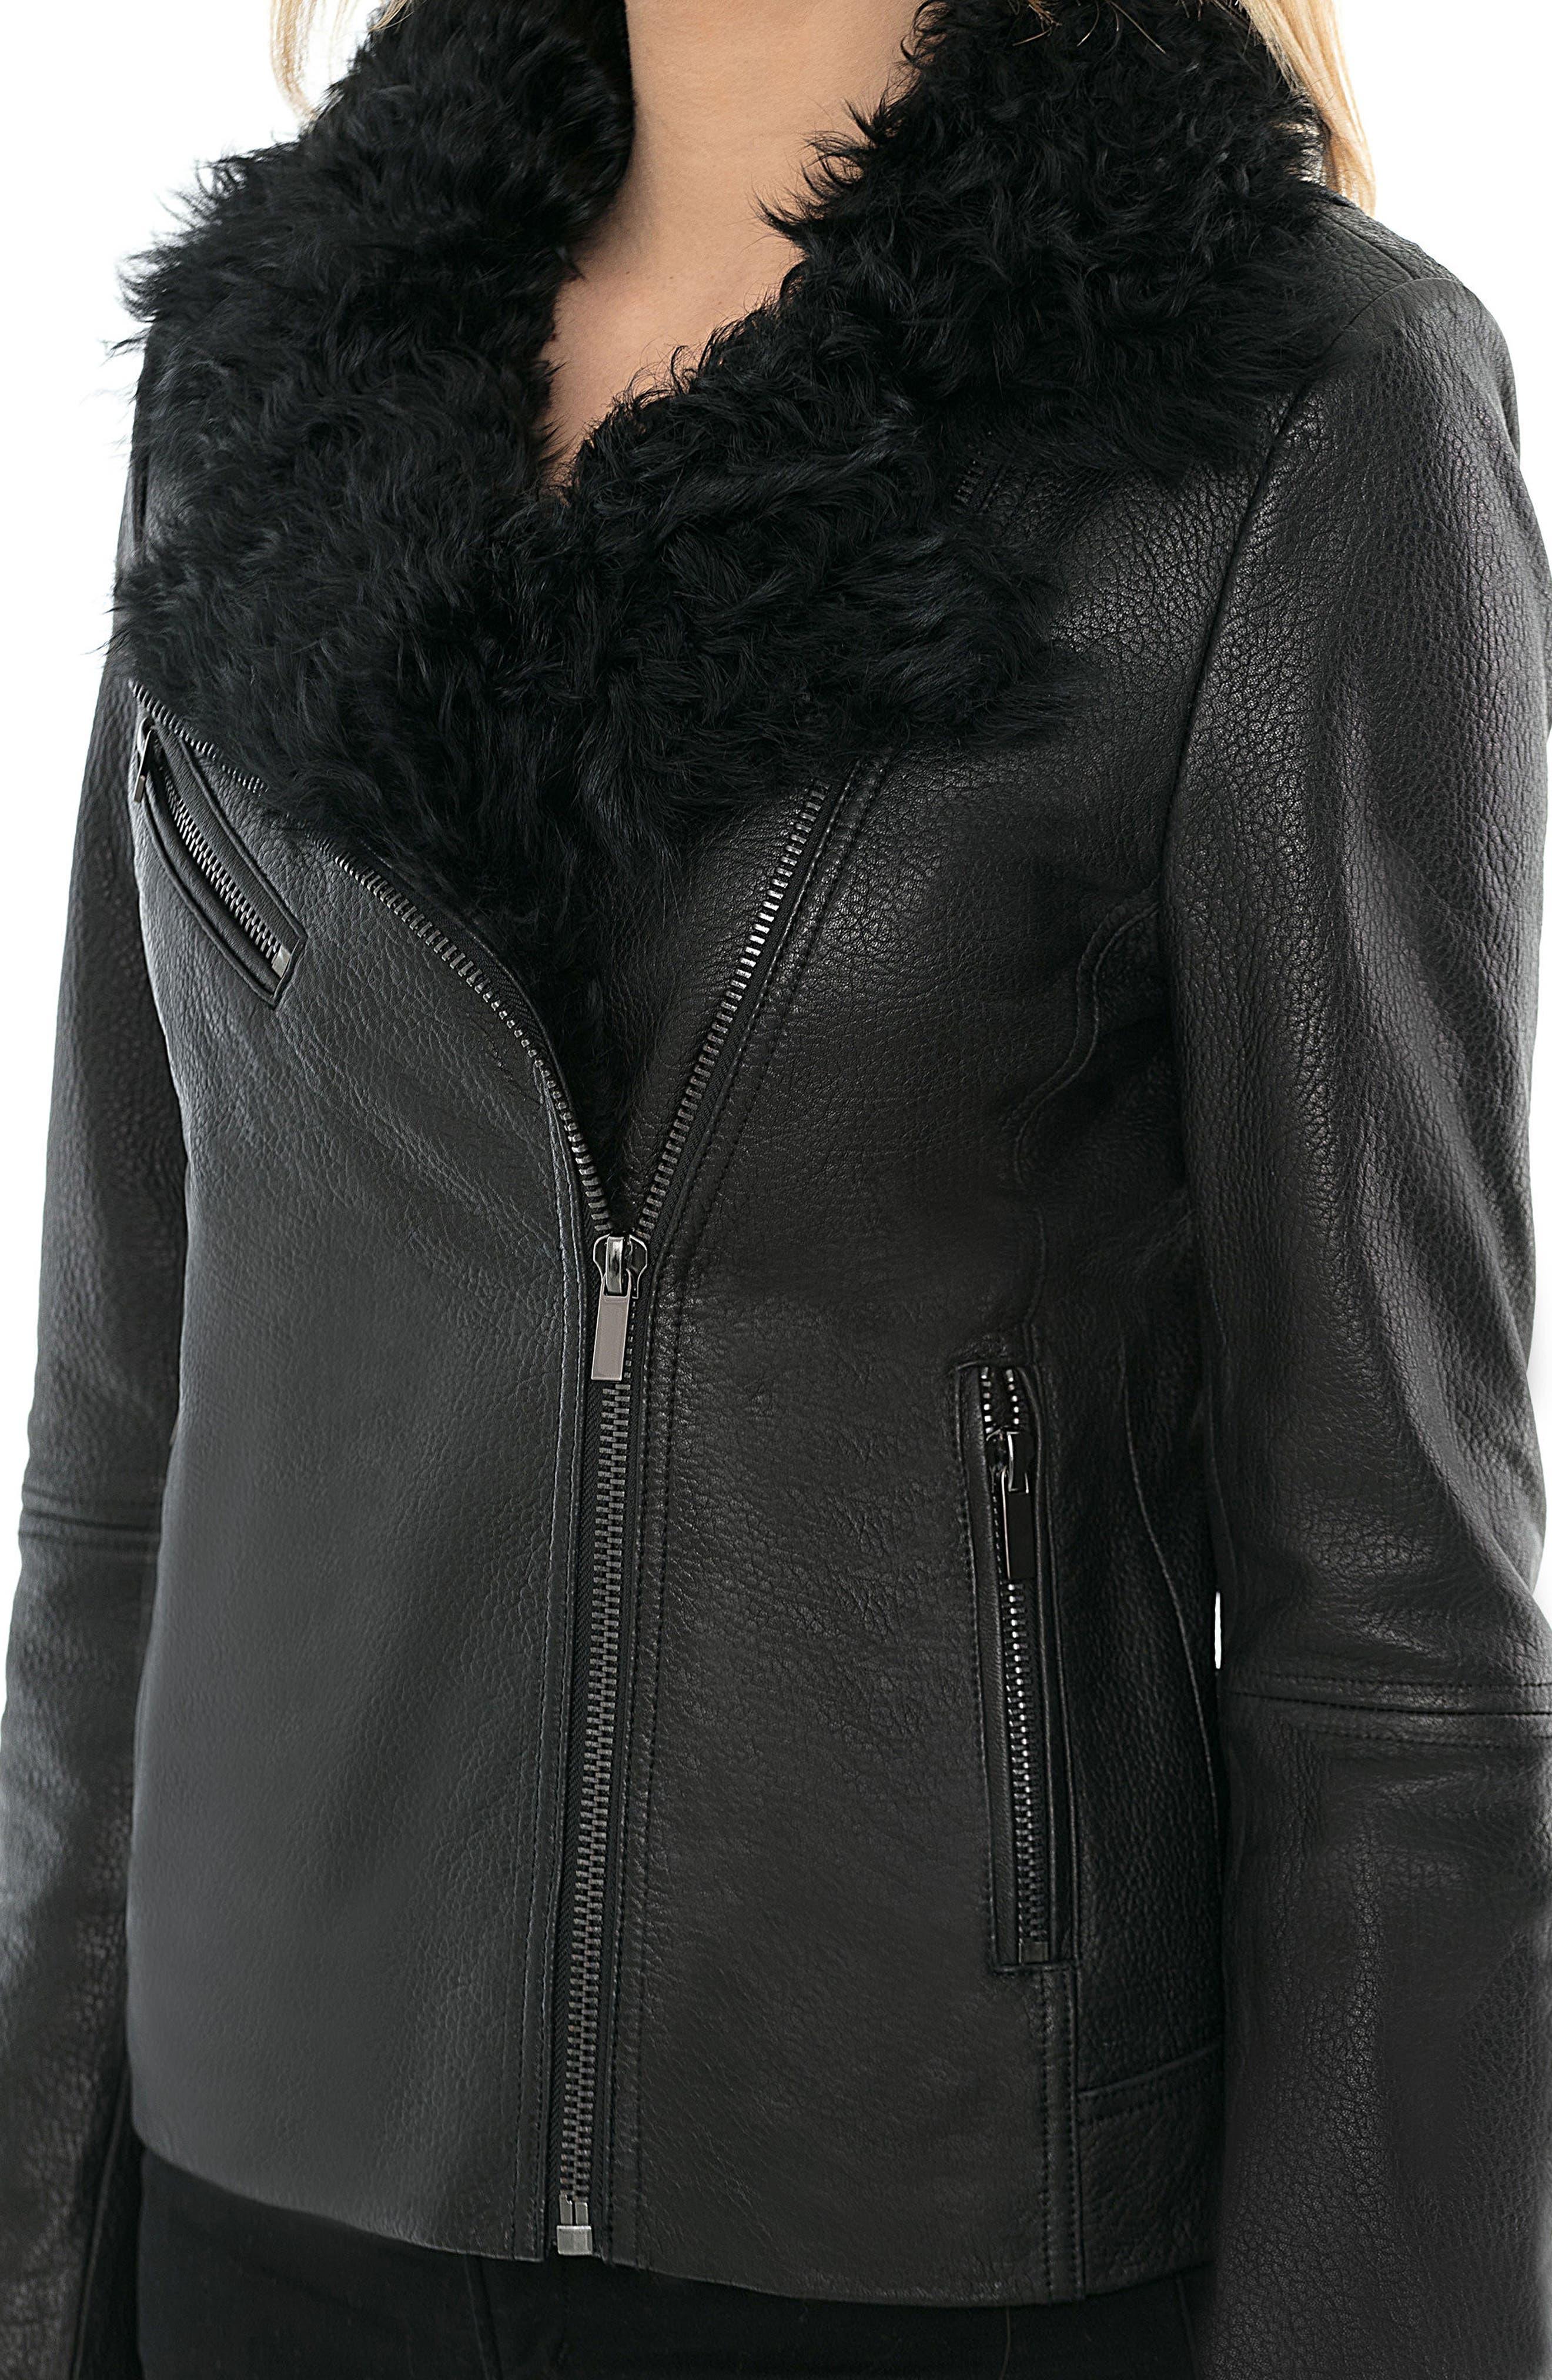 Marianne Genuine Shearling Collar Moto Jacket,                             Alternate thumbnail 4, color,                             001